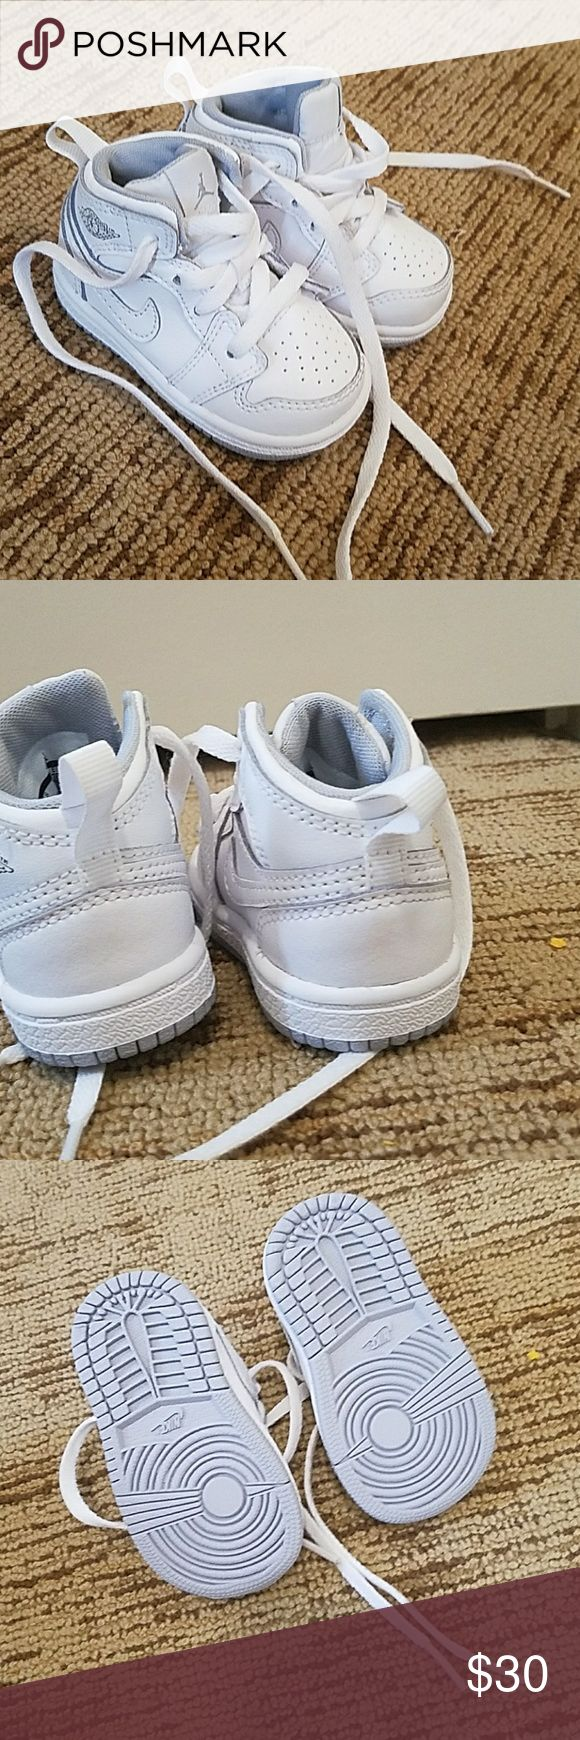 Air jordans All white grey bottoms Jordan Shoes Sneakers